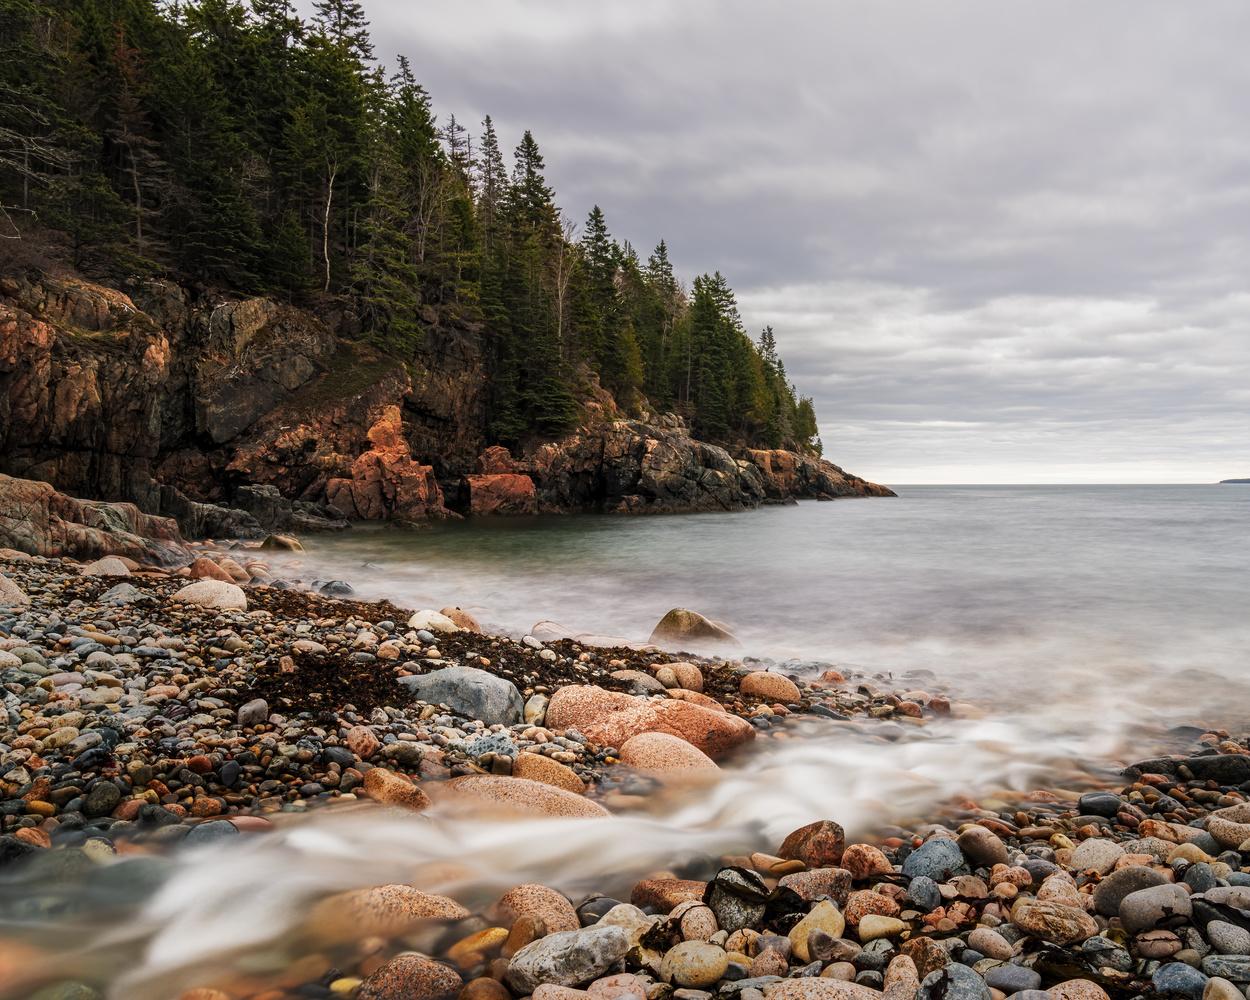 Acadia National Park, Maine, USA by Skyler Ewing